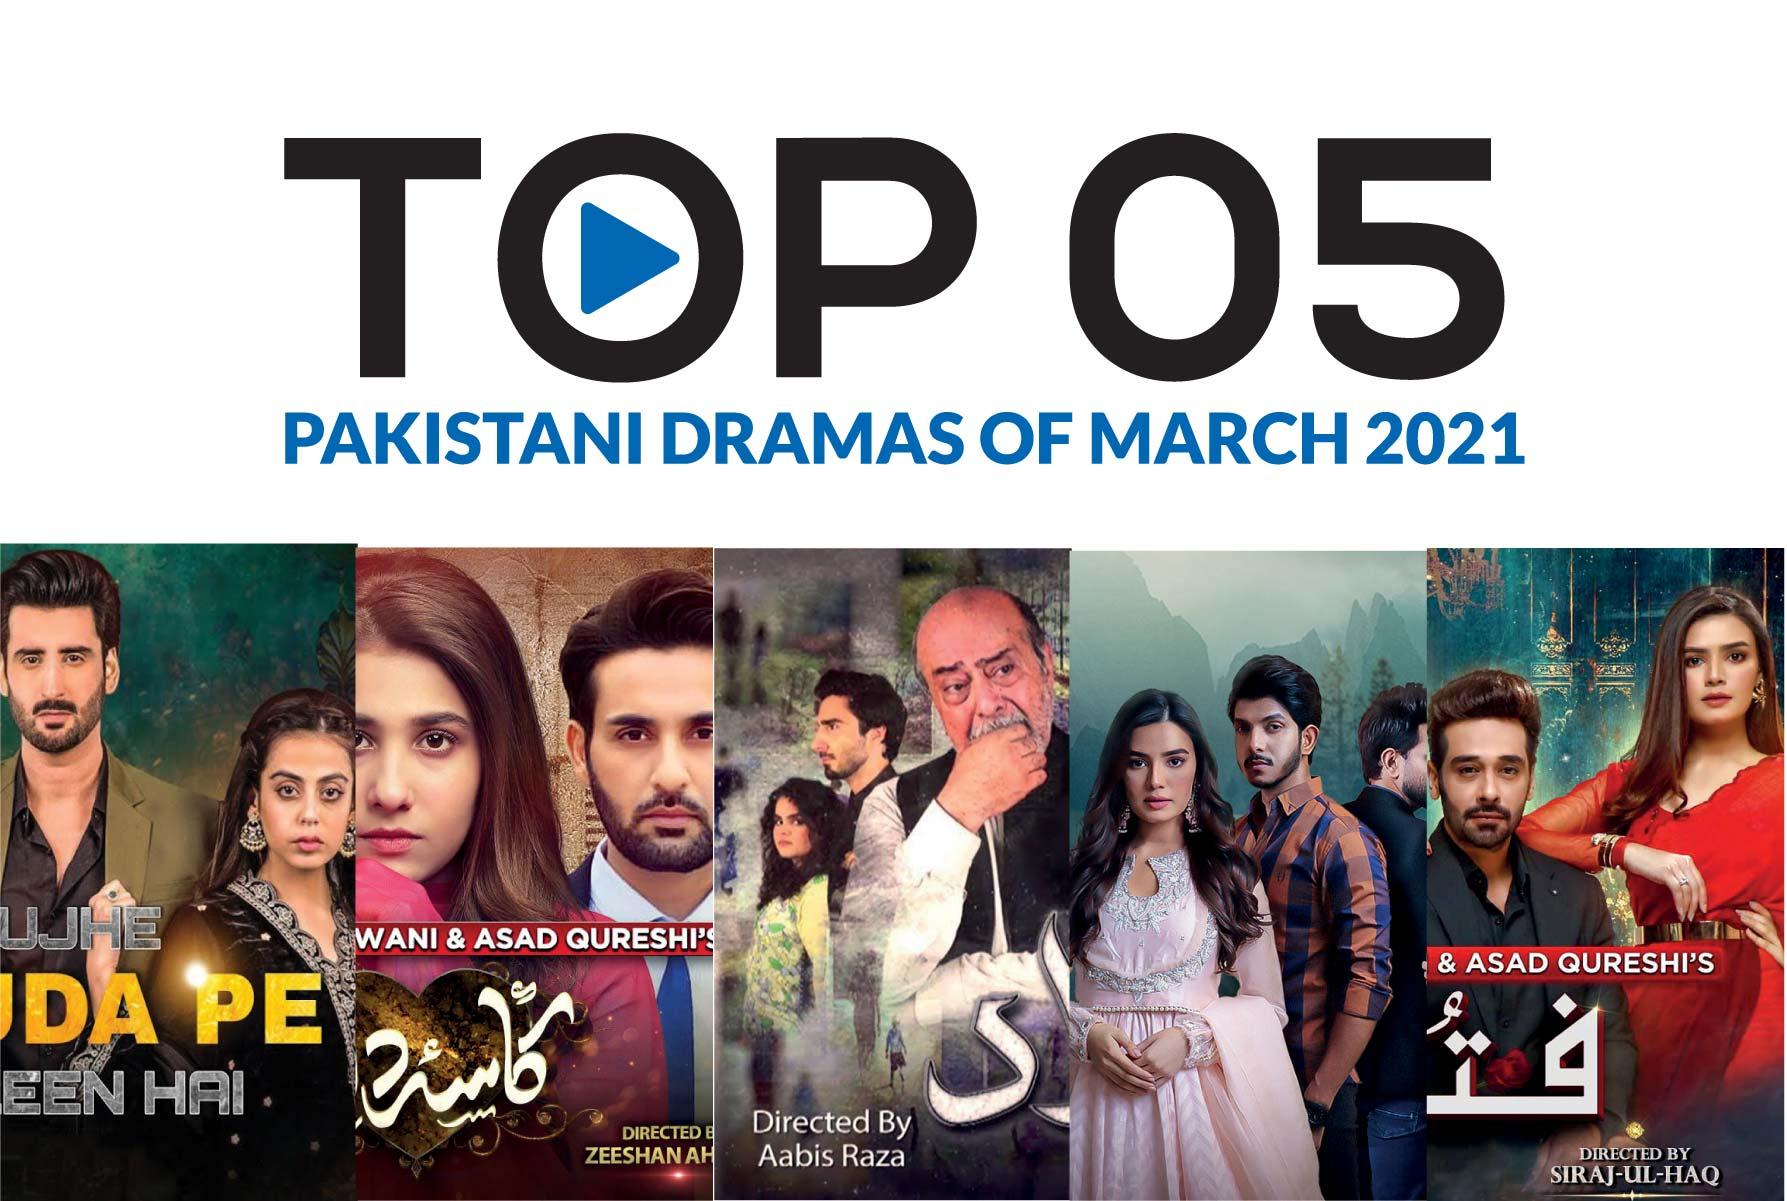 Top 5 Pakistani dramas of March 2021